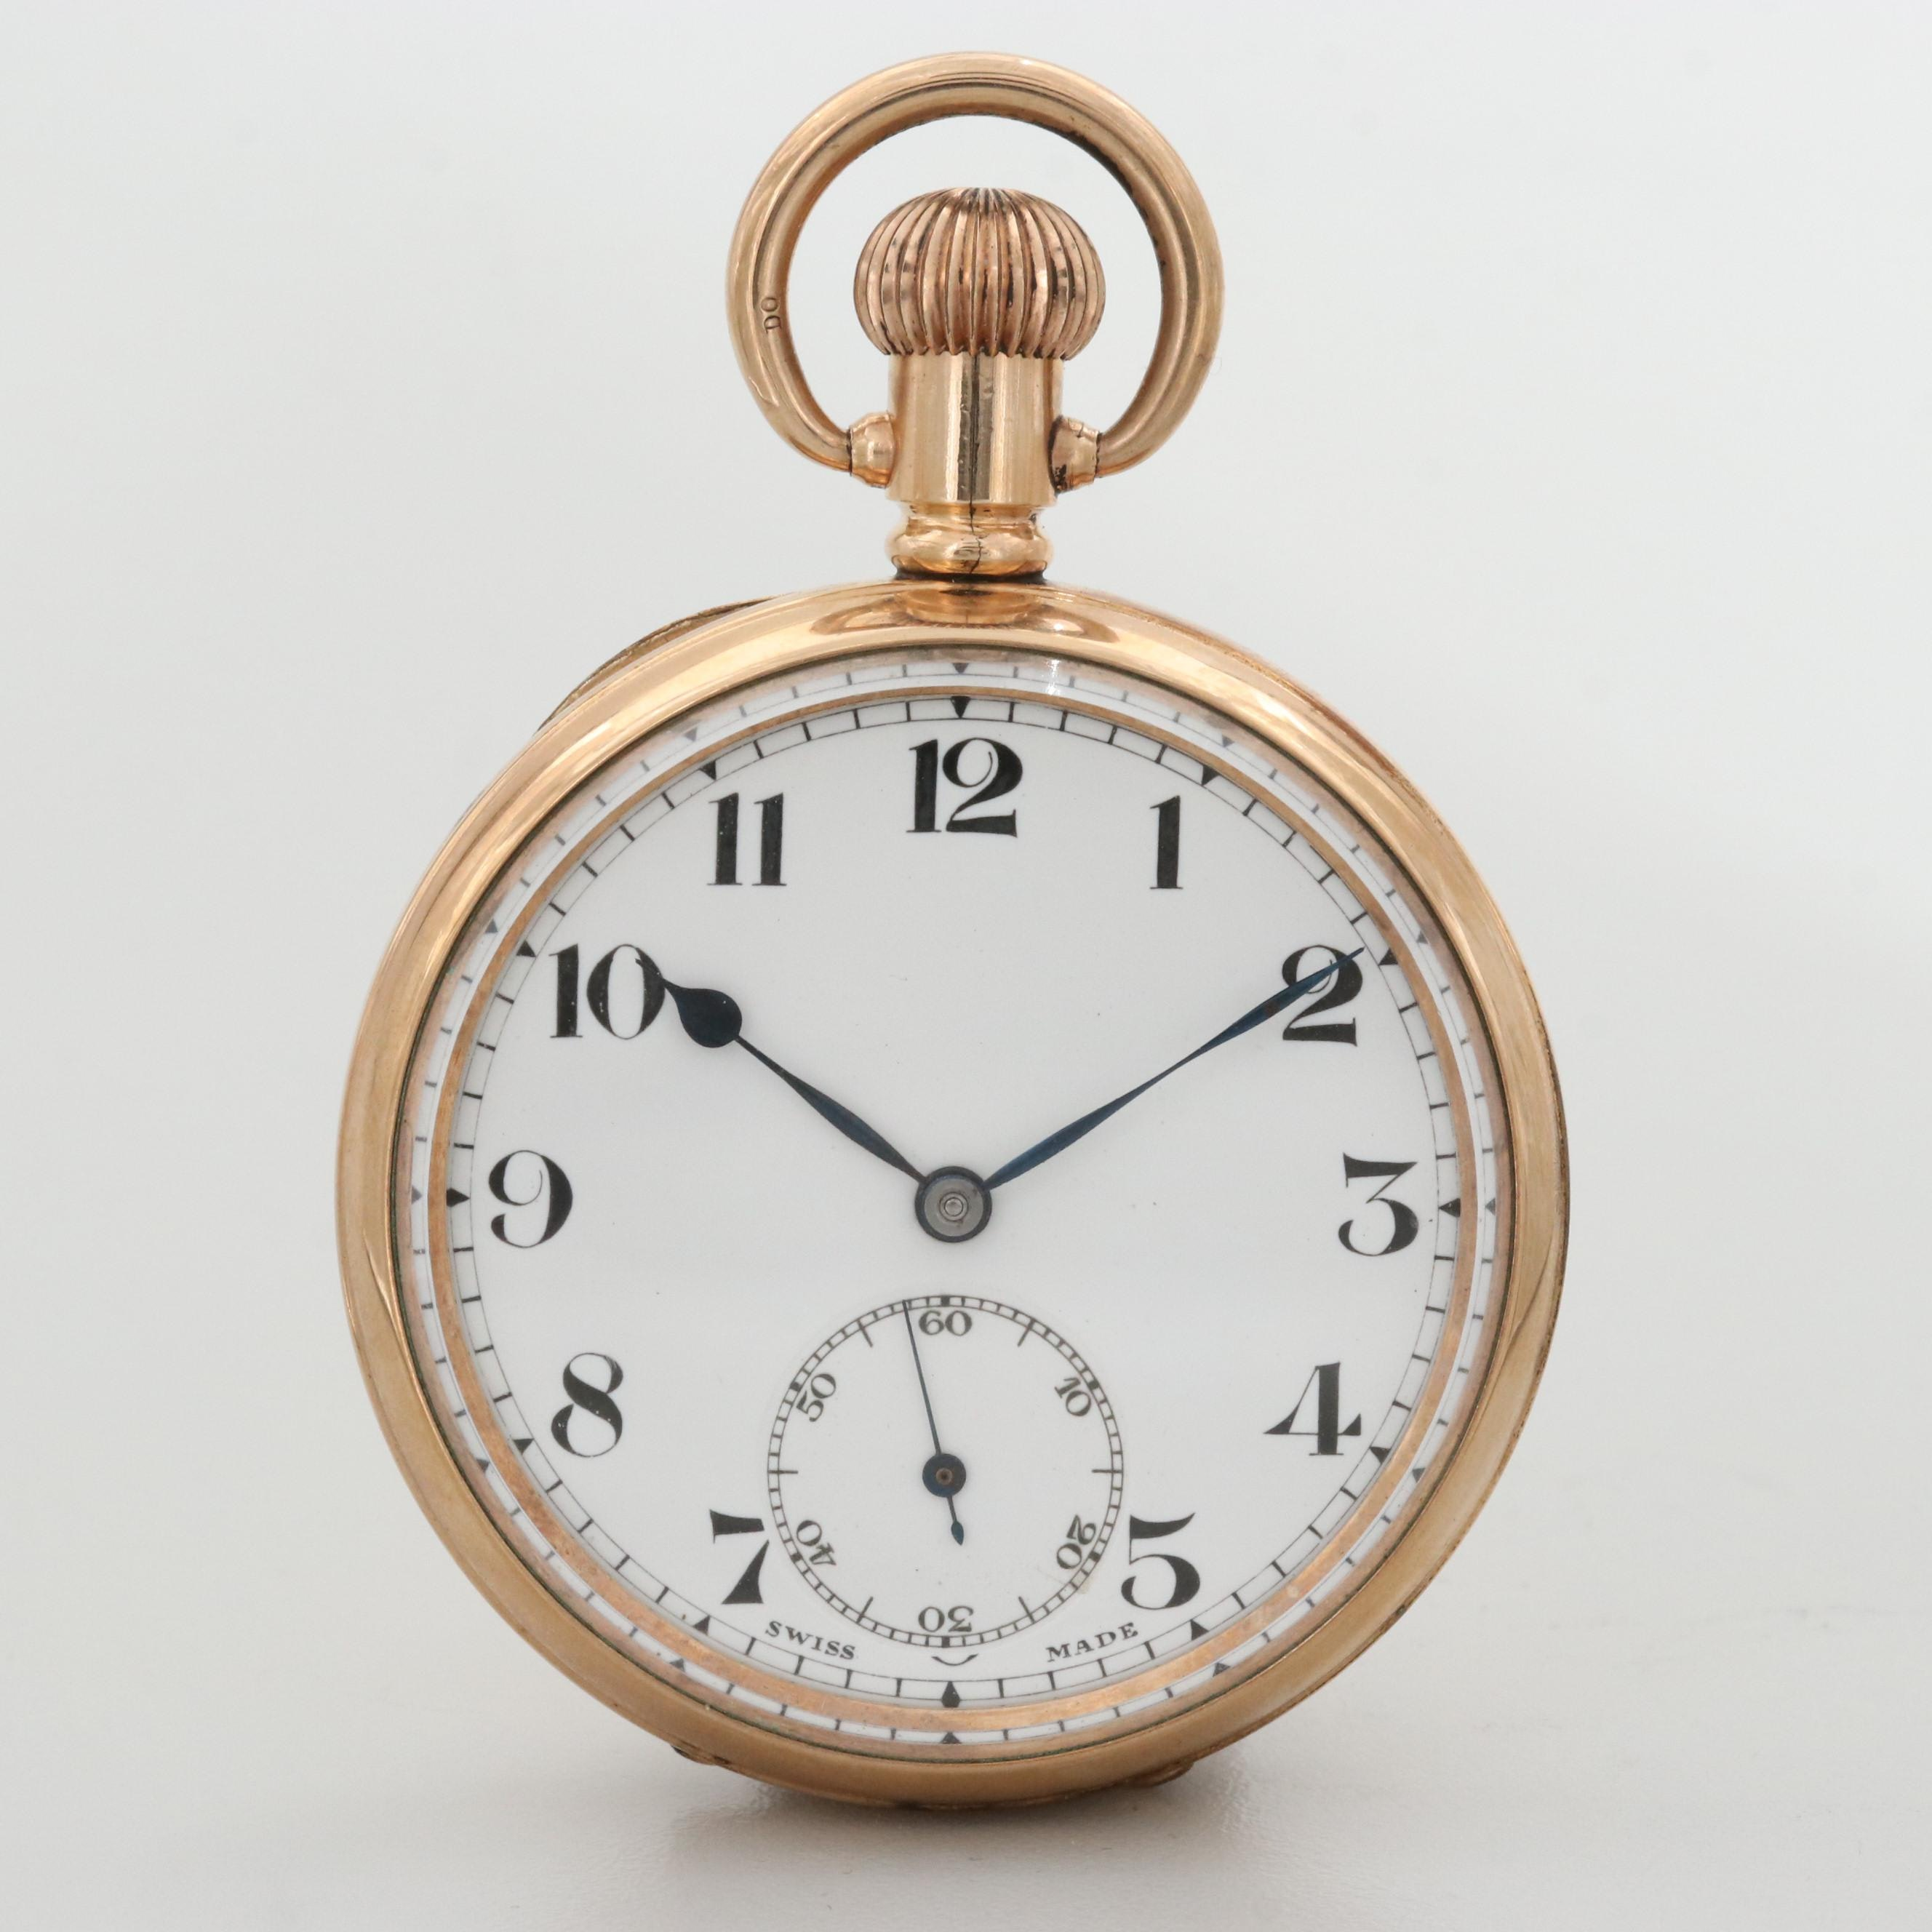 Vintage Swiss Gold Filled Open Face Pocket Watch